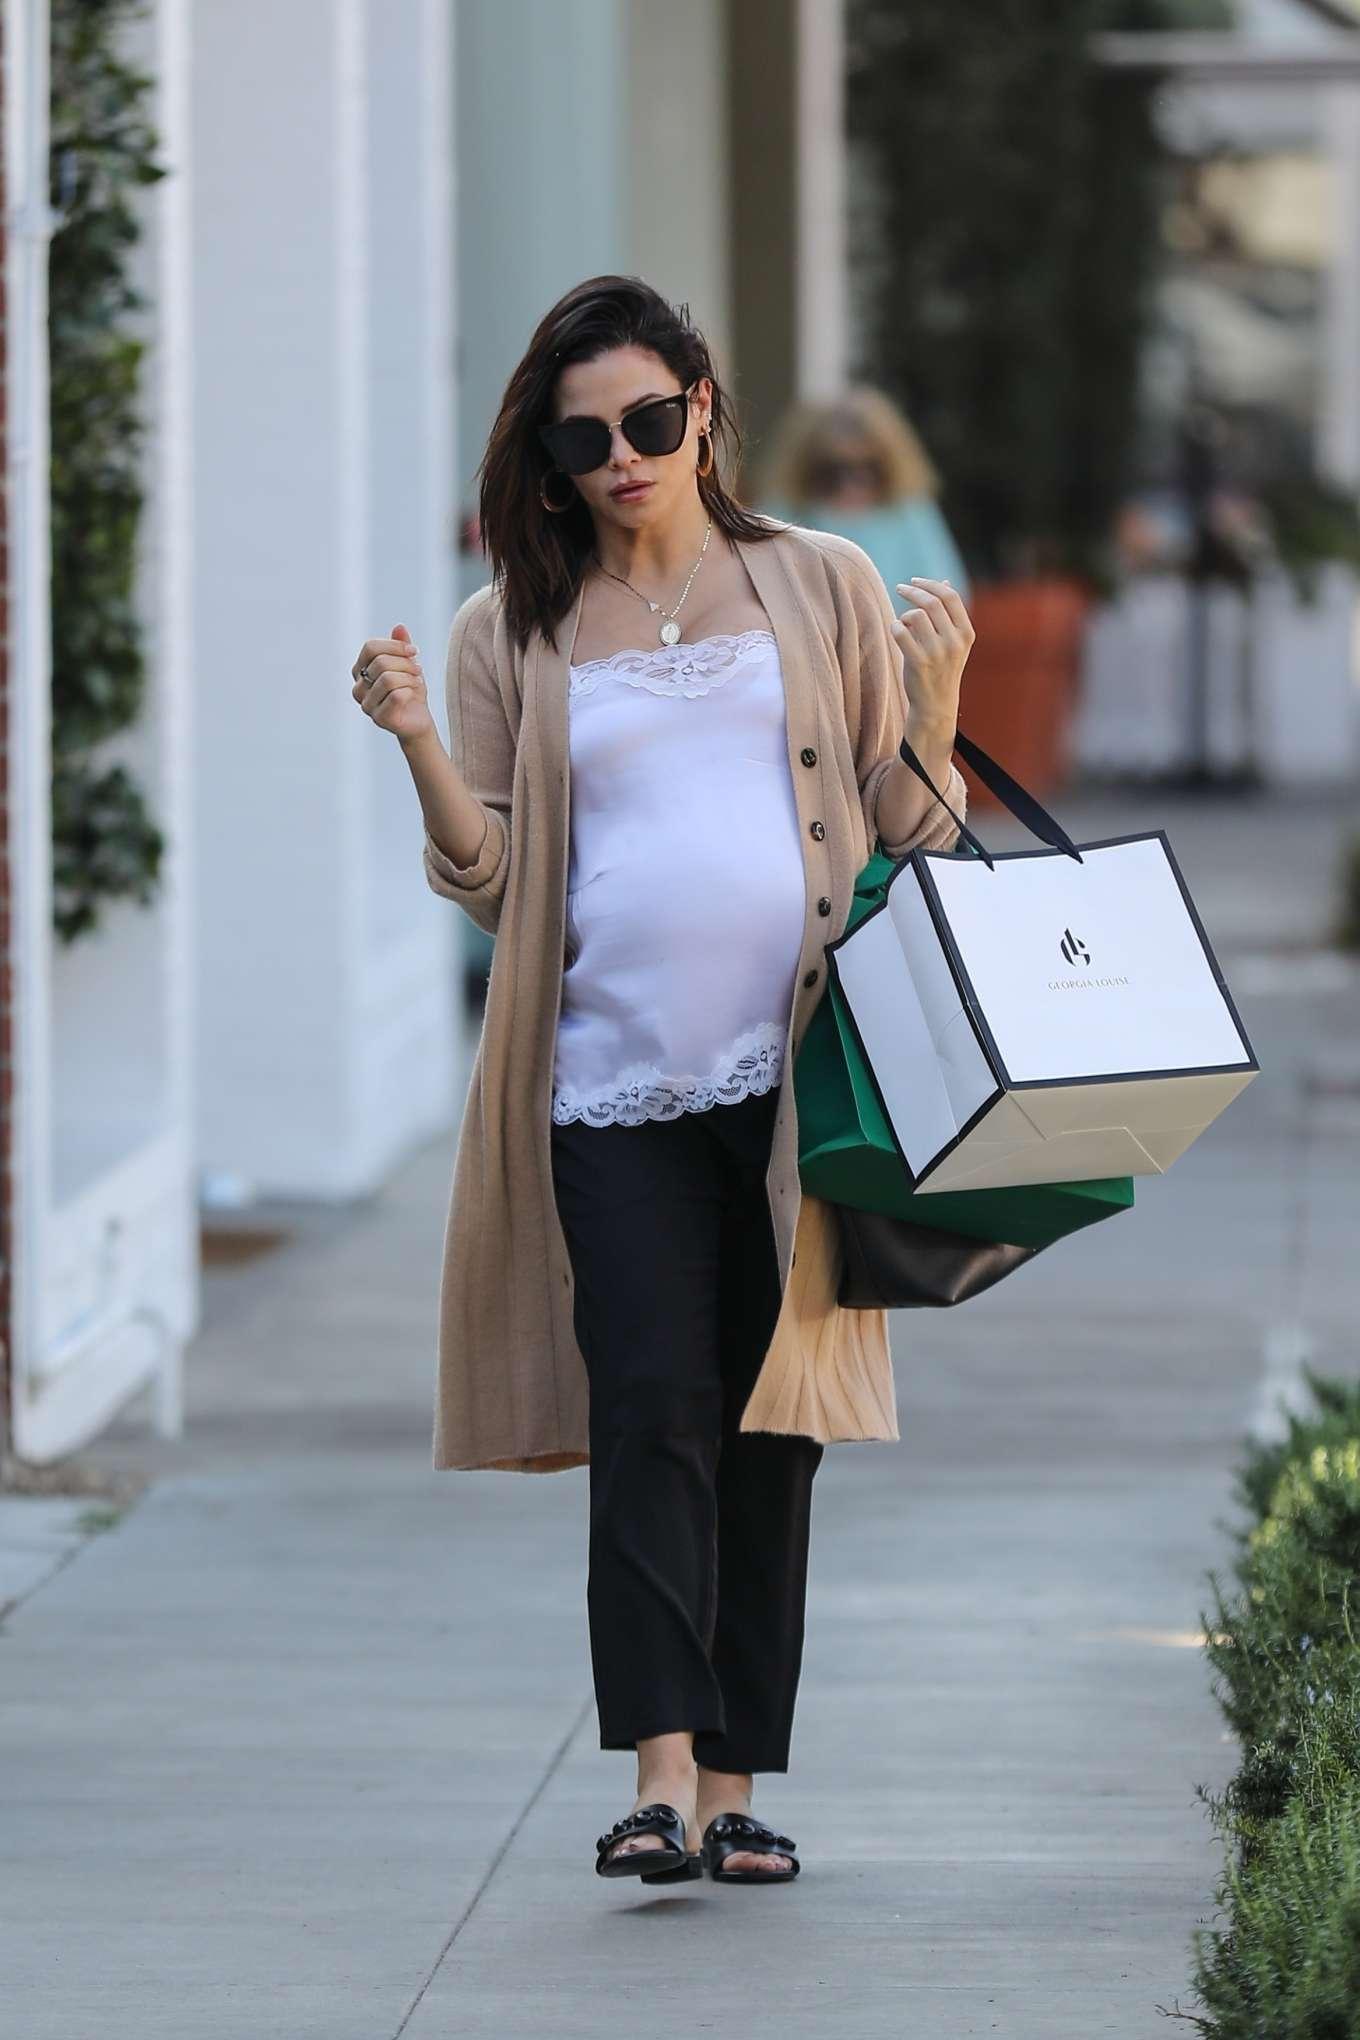 Jenna Dewan goes on a shopping spree in West Hollywood